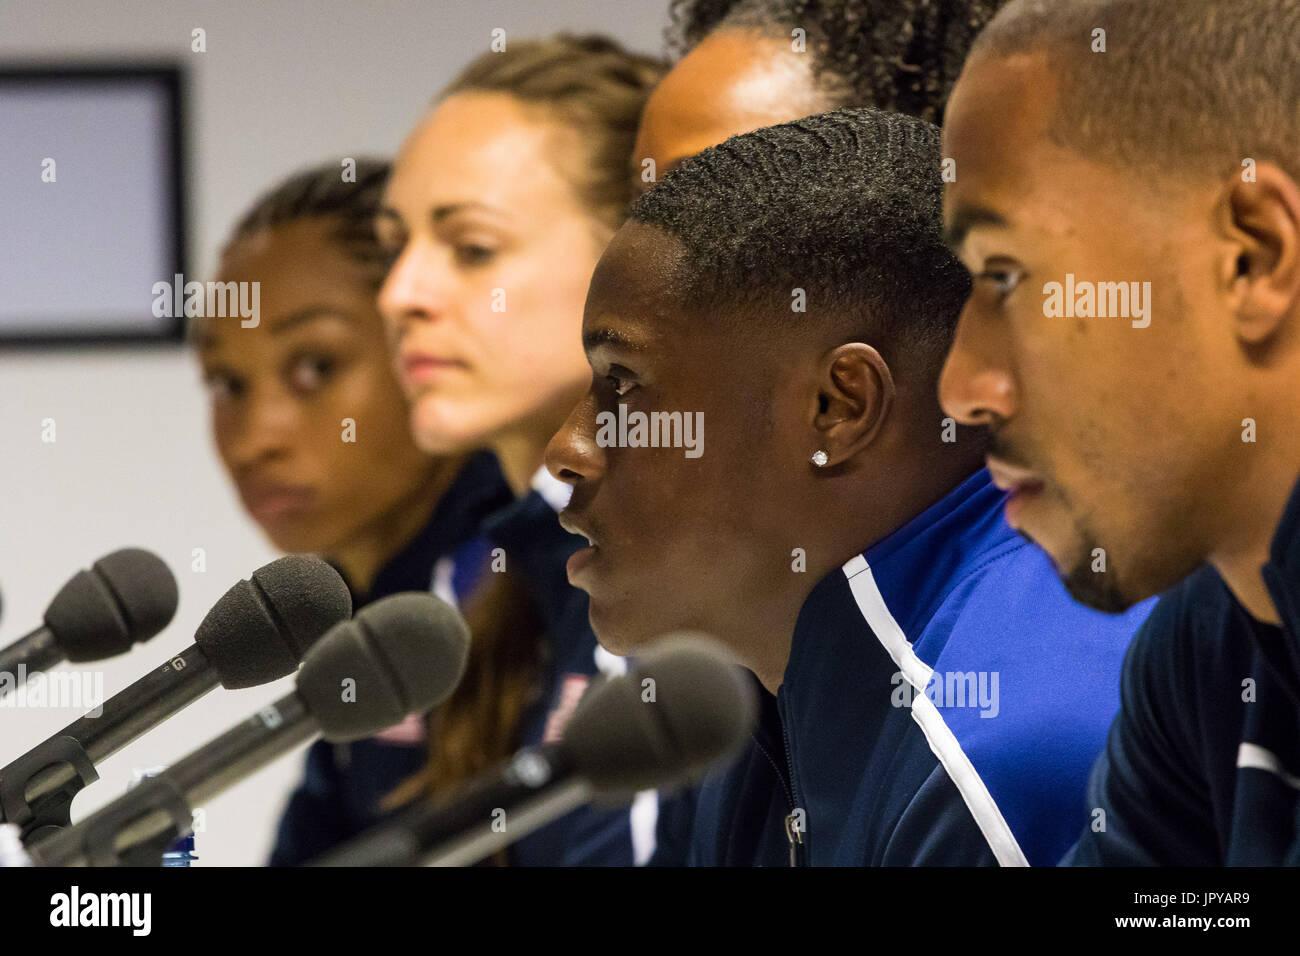 London, UK. 03rd Aug, 2017. London, 03 August 2017. Christian Coleman, 2016 Rio Olympian & 2017 100m world leader Stock Photo